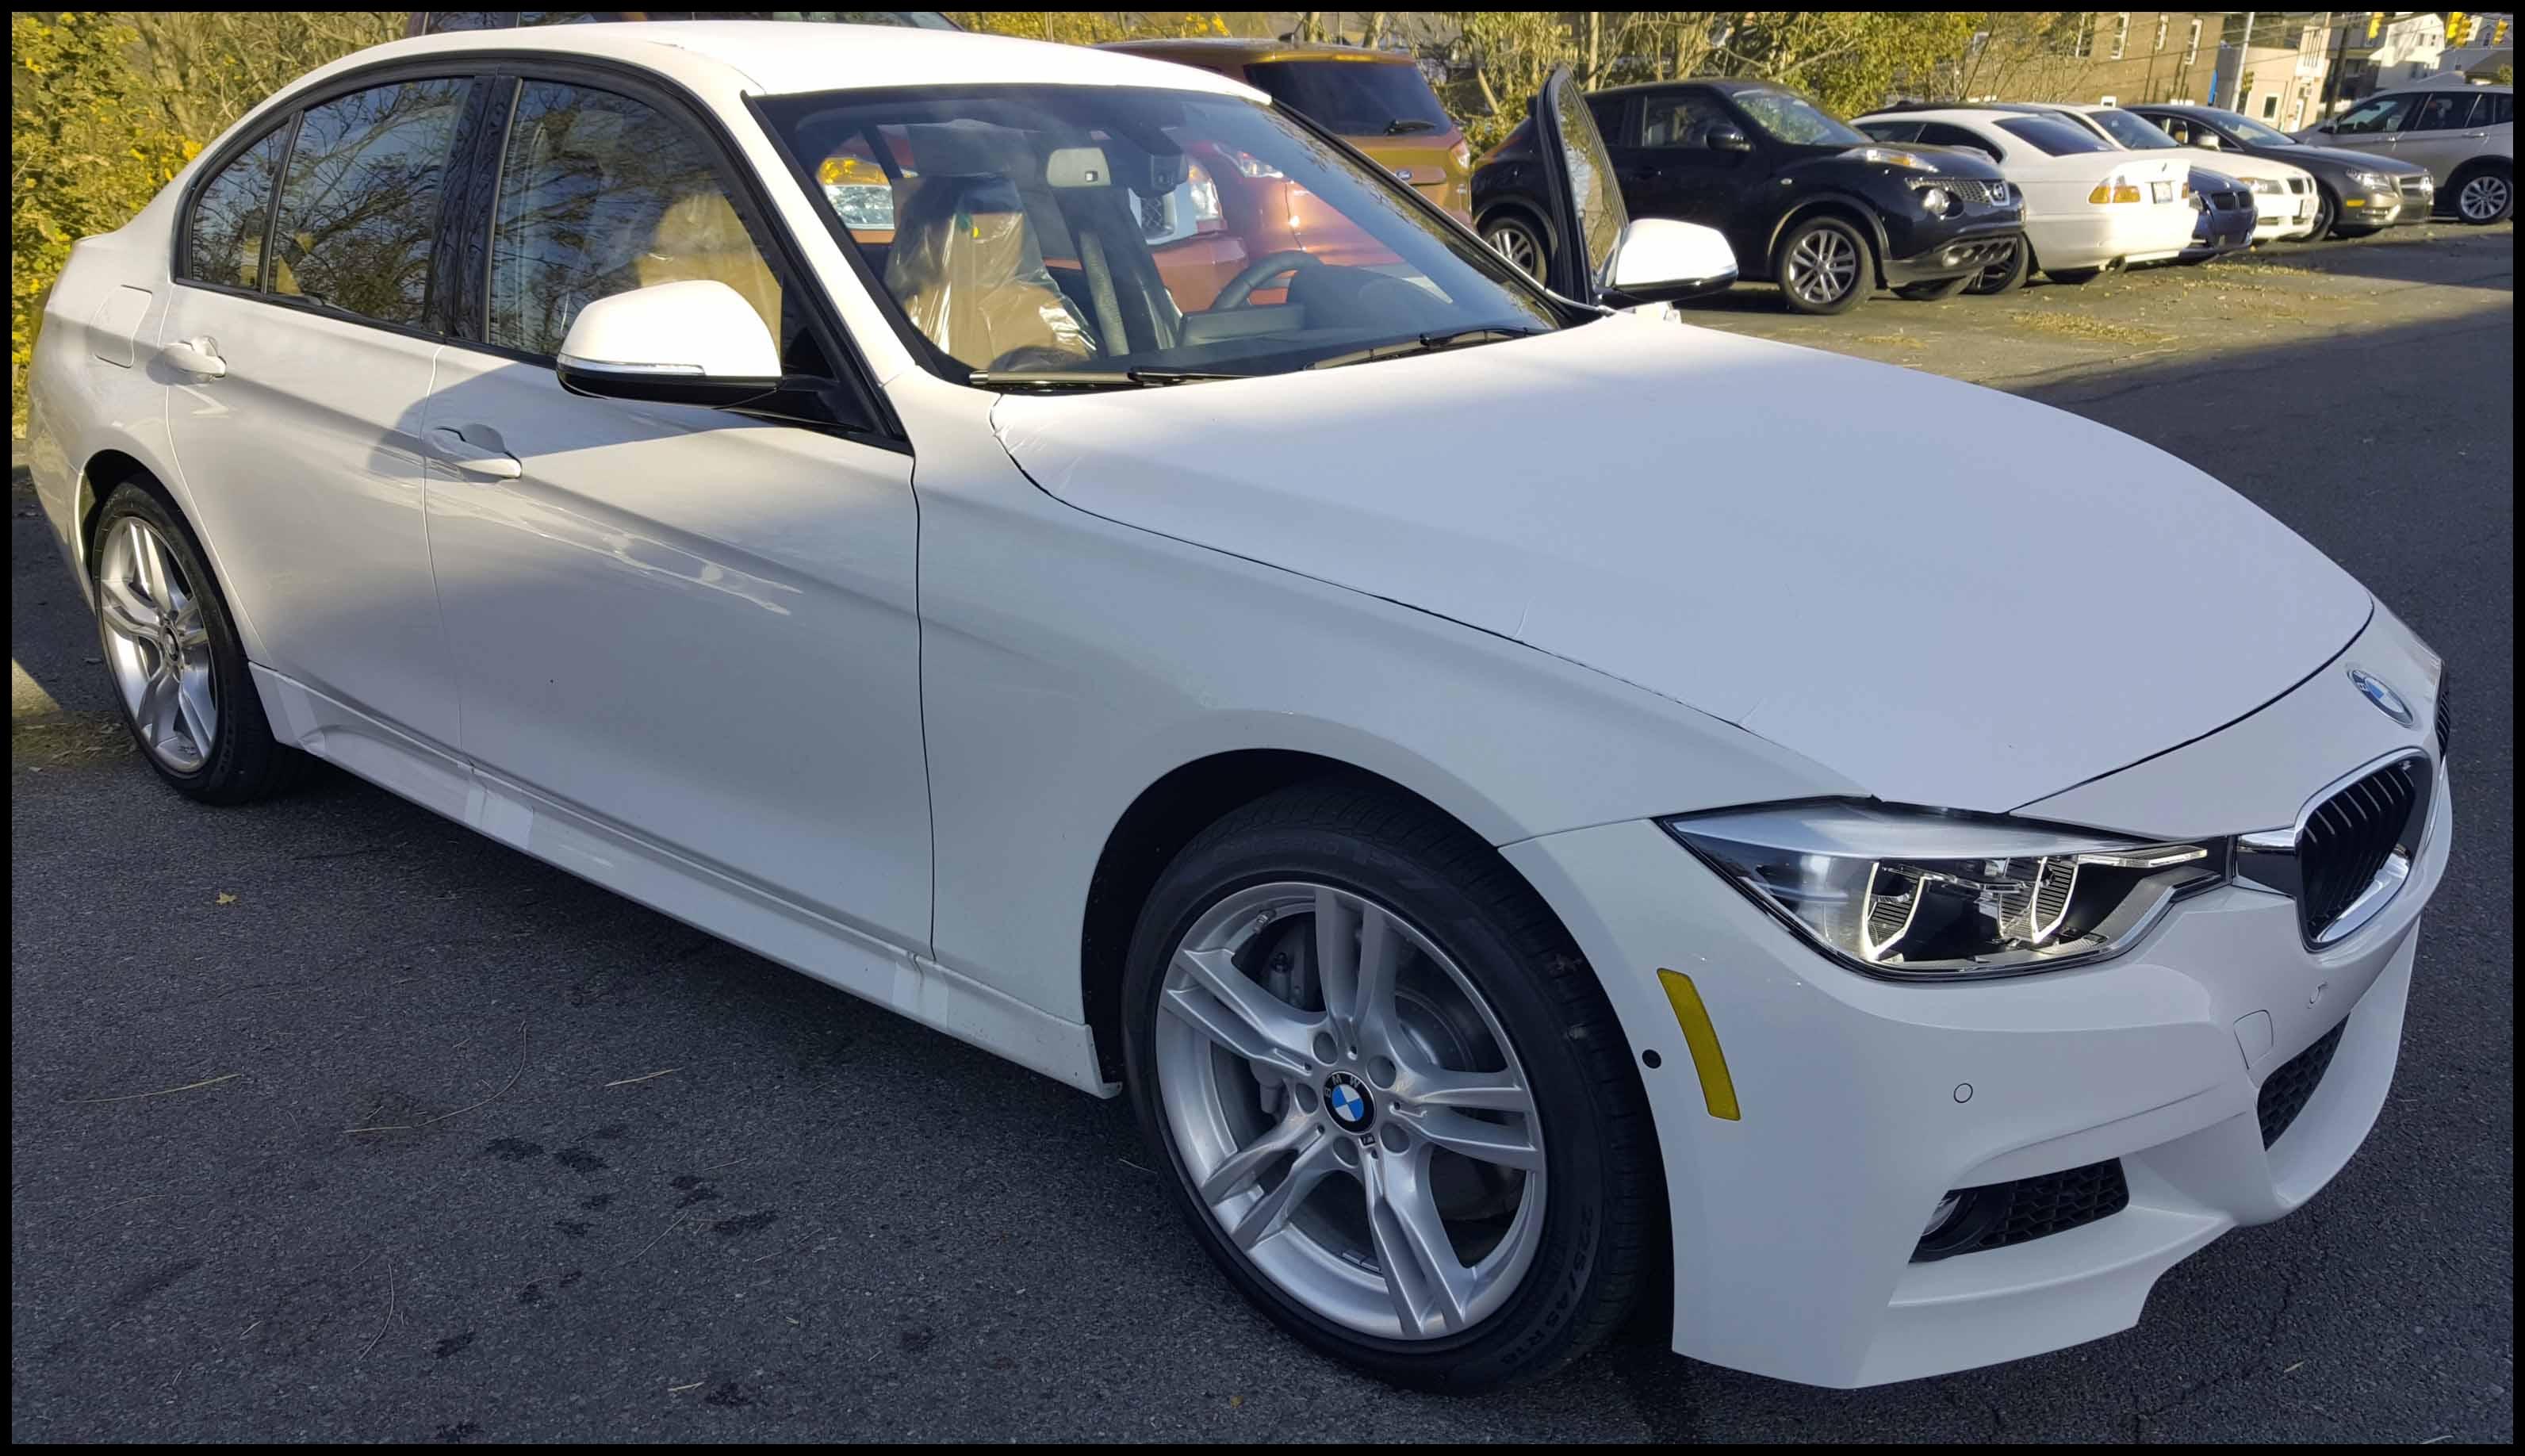 BMW 3 Series Touring Fuel Economy Car BMW